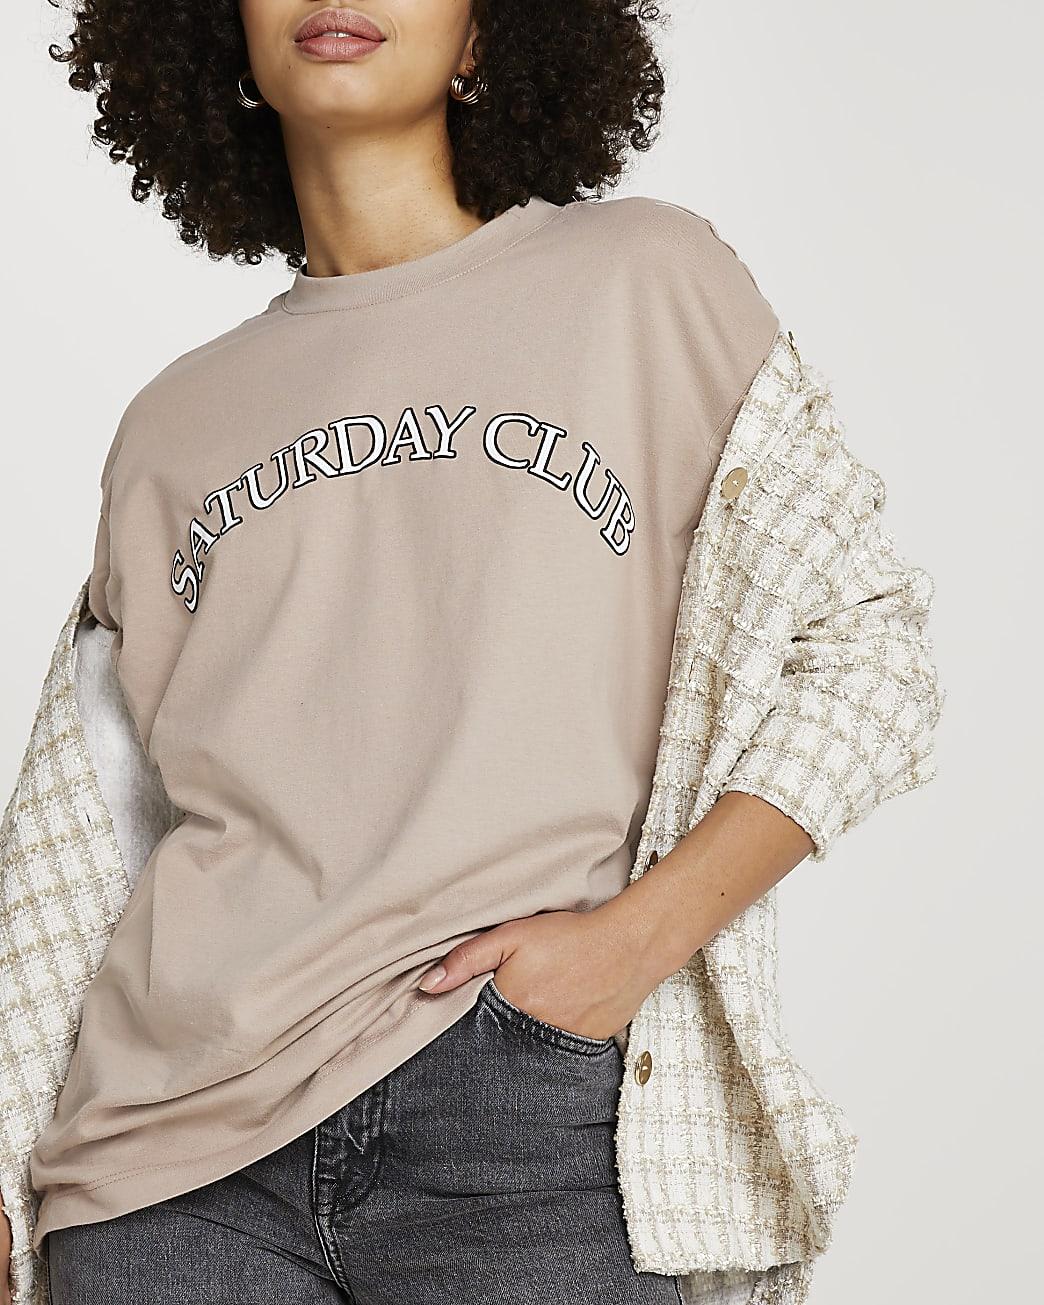 Beige 'Saturday Club' oversized t-shirt